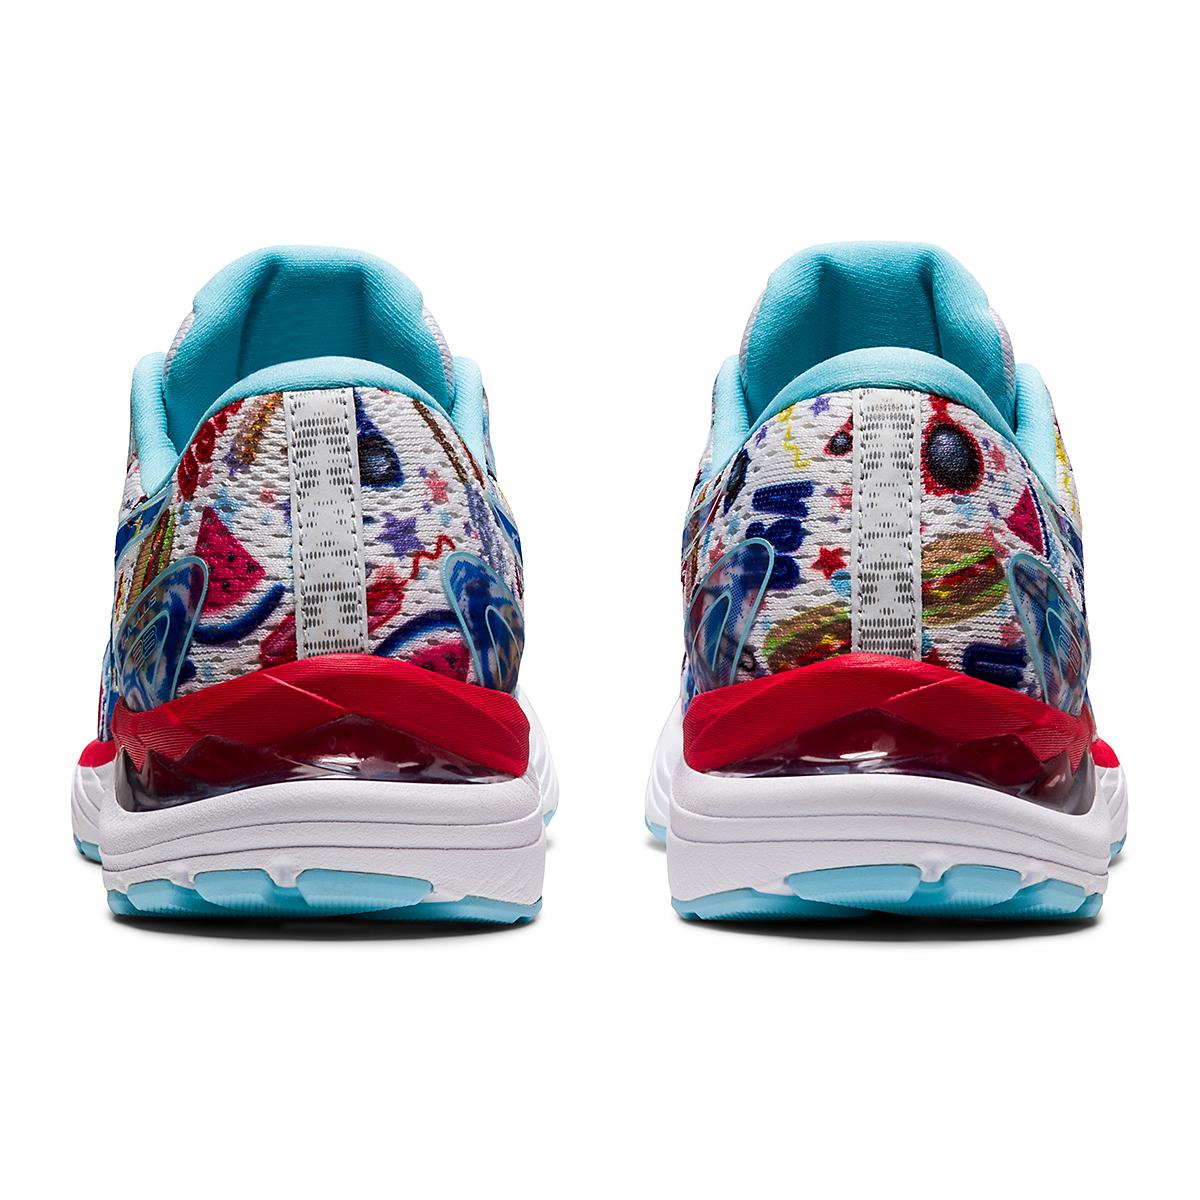 Women's Asics Gel-Cumulus 23 Cookout Running Shoe - Color: White/Asics Blue - Size: 5 - Width: Regular, White/Asics Blue, large, image 5